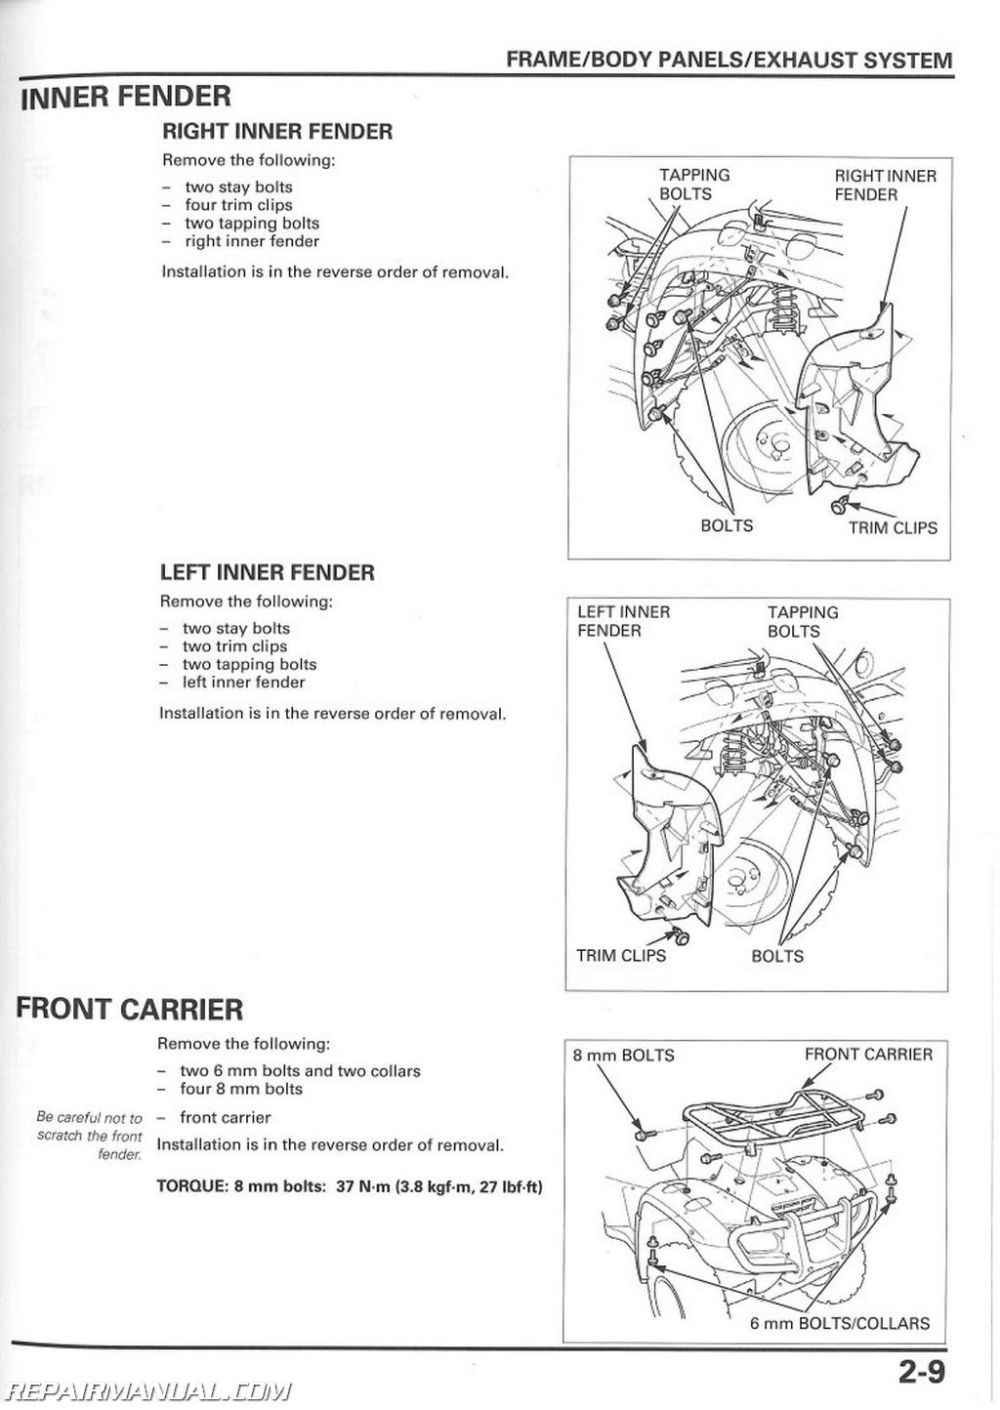 medium resolution of honda trx500fa fga fourtrax foreman rubicon gpscape atv servicehonda trx500fa fga fourtrax foreman rubicon gpscape atv